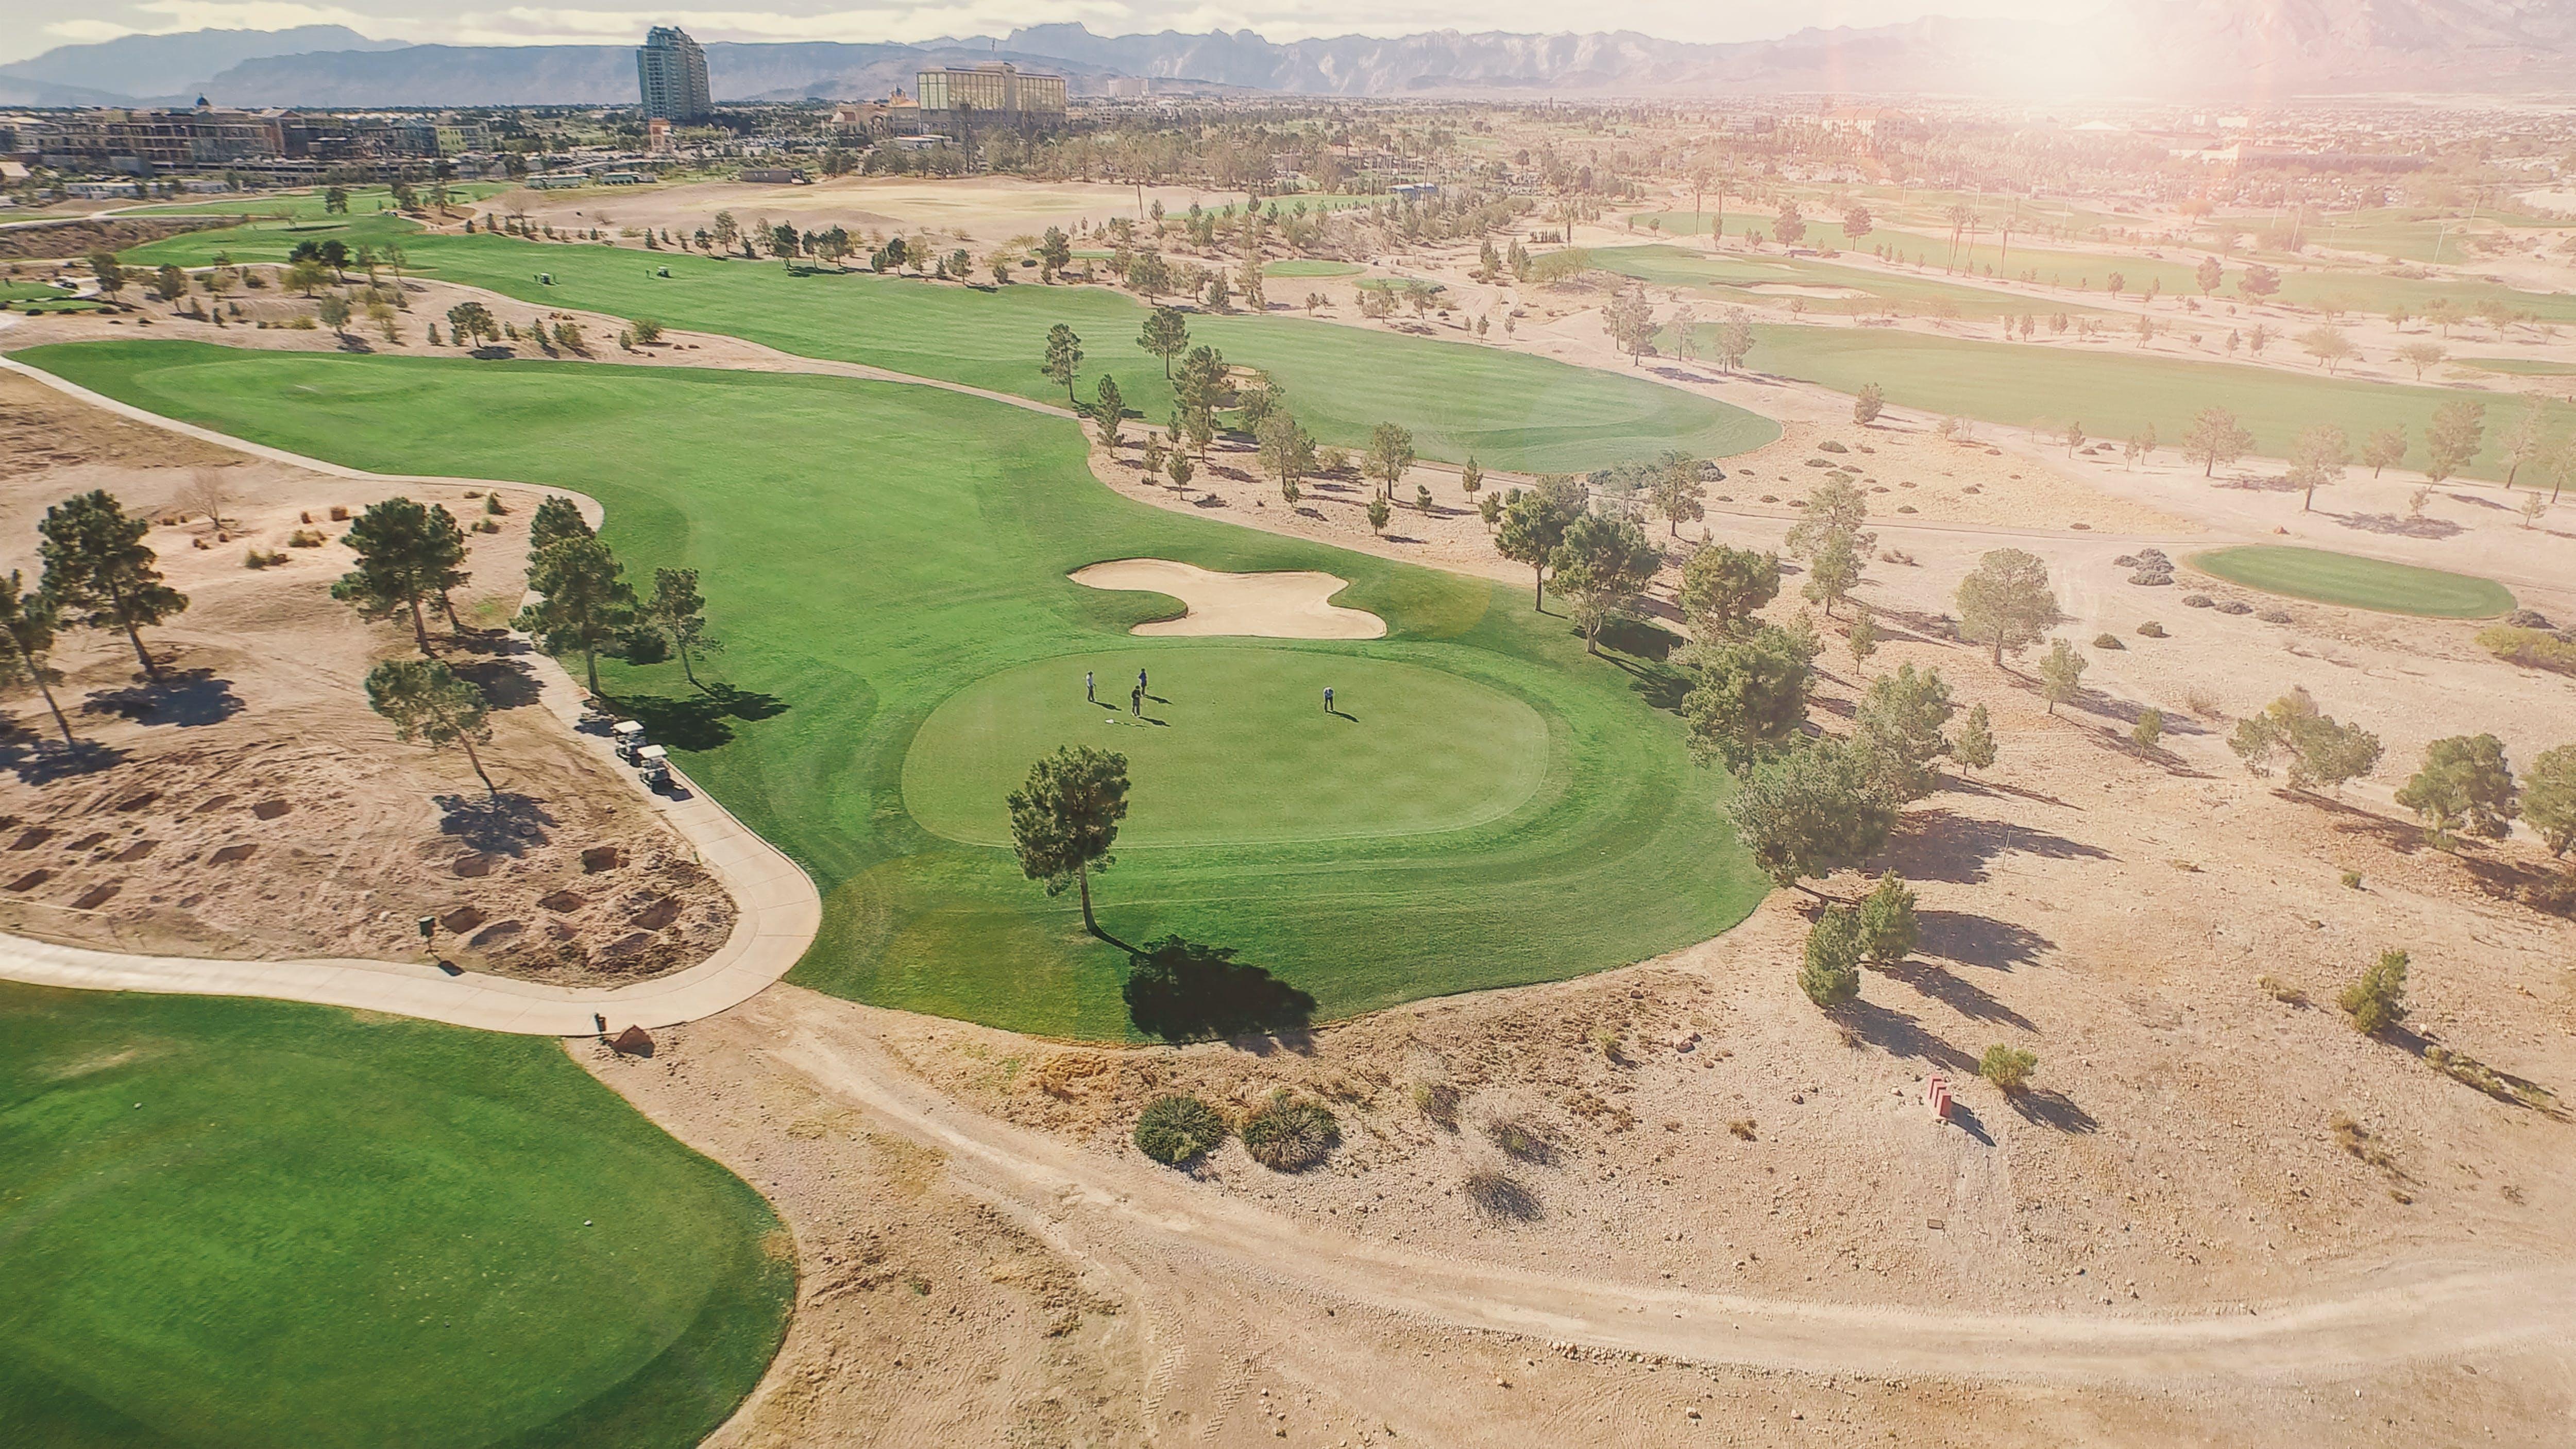 Golf Course Under Sunny Sky